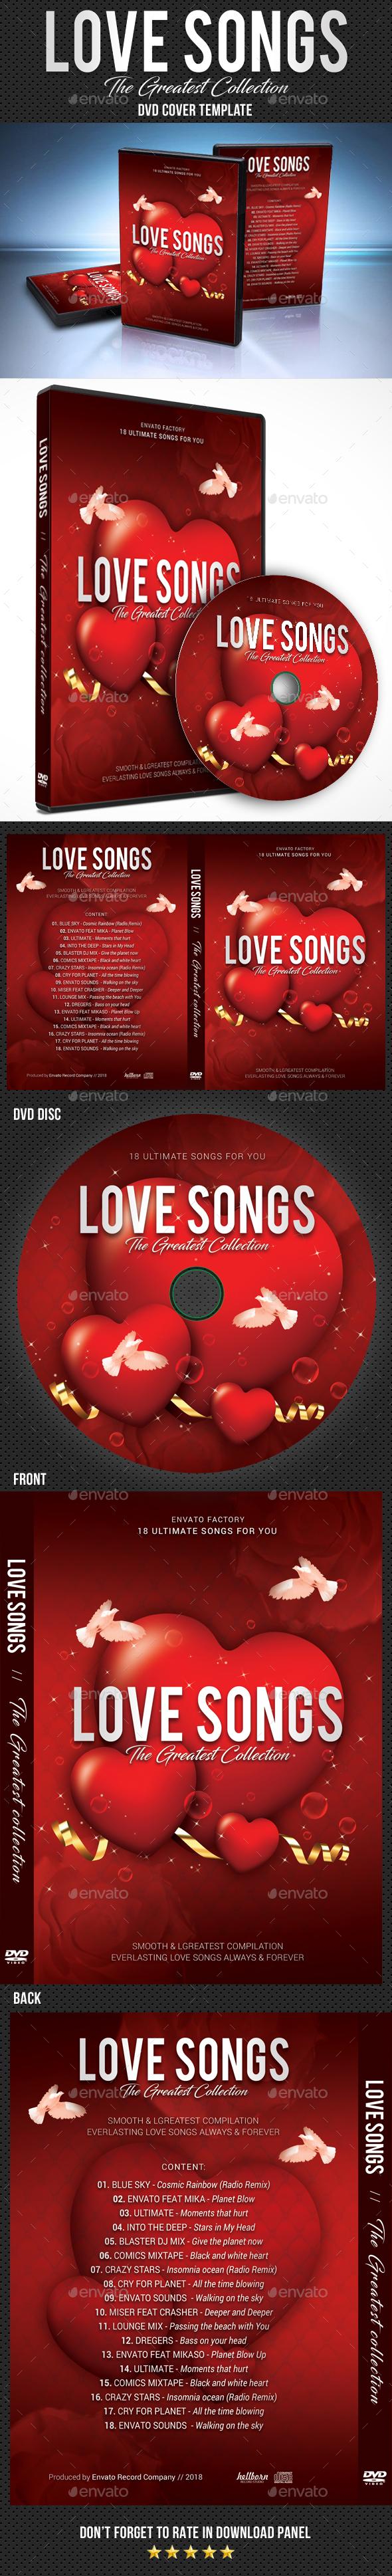 Love Songs DVD Cover Template - CD & DVD Artwork Print Templates